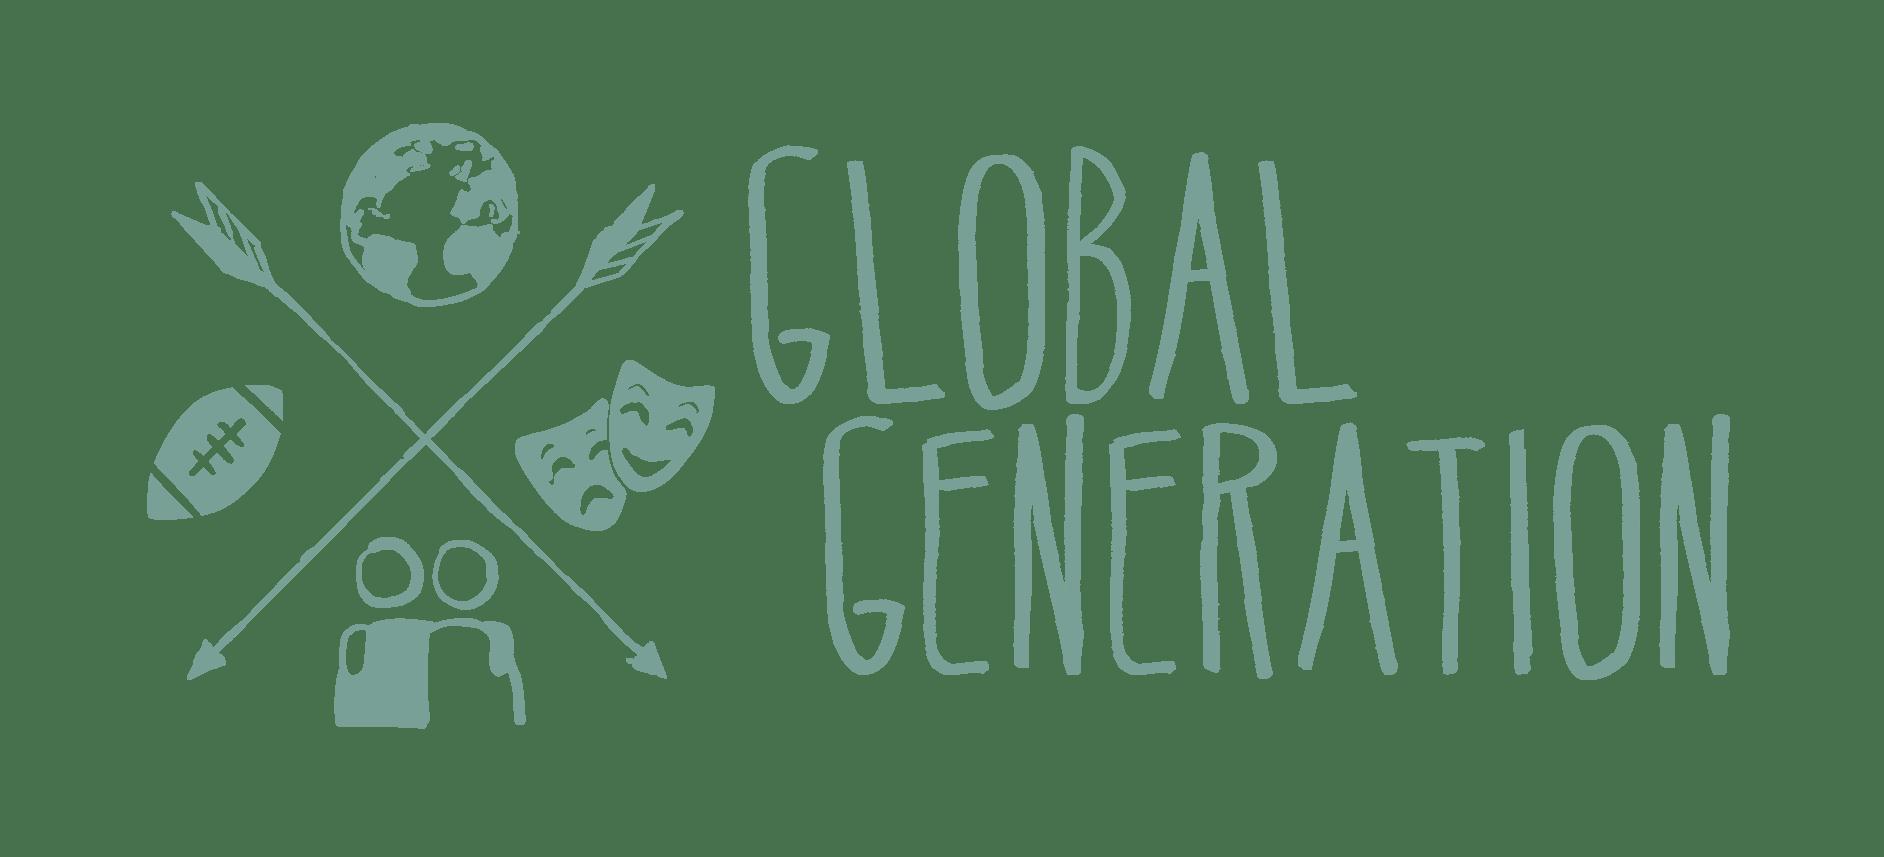 GlobalGeneration_Logo_verde_1_vertical